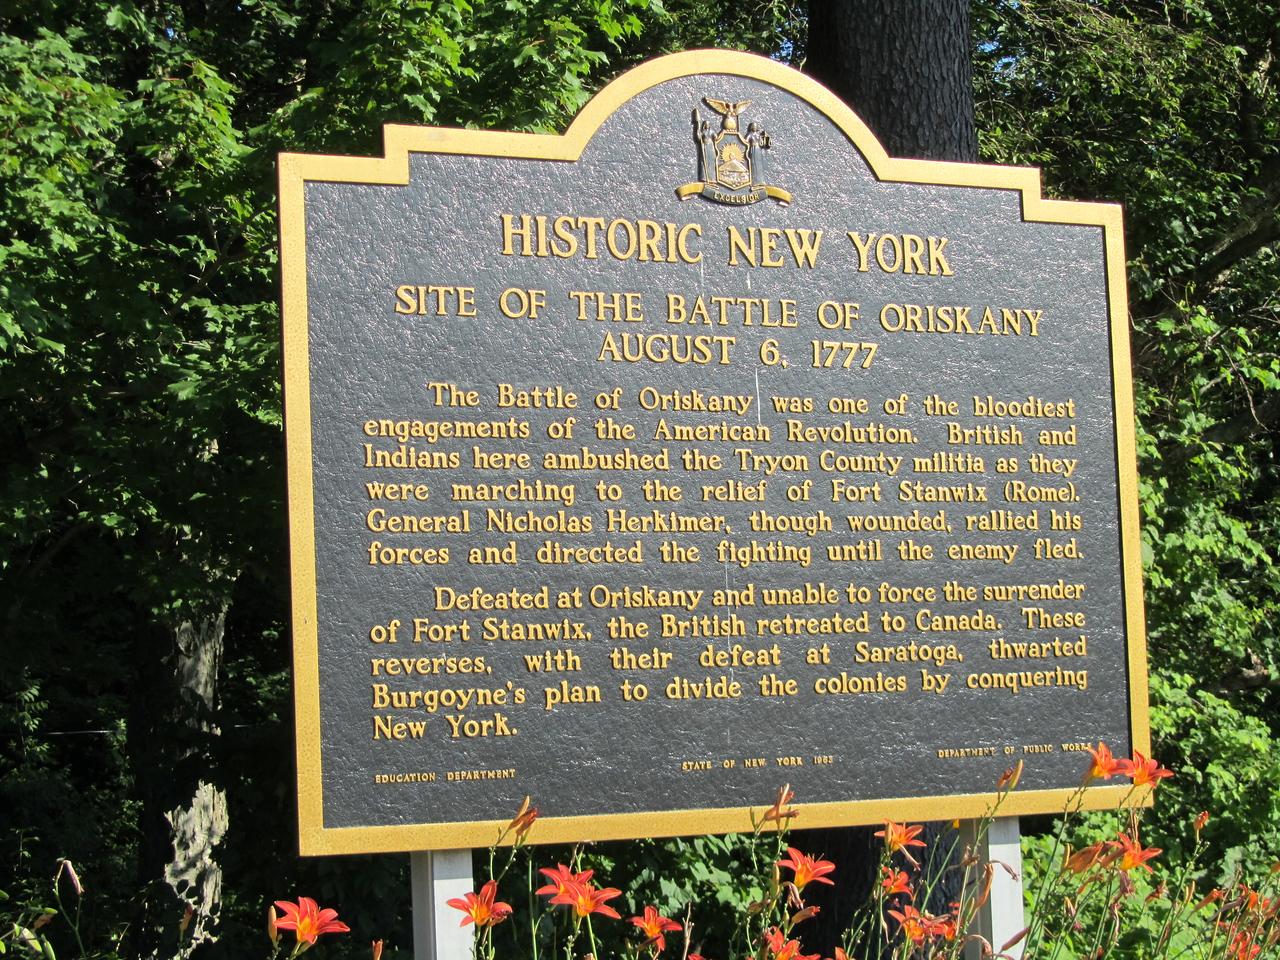 Oriskany battlefield, a turning point in the American revolution.